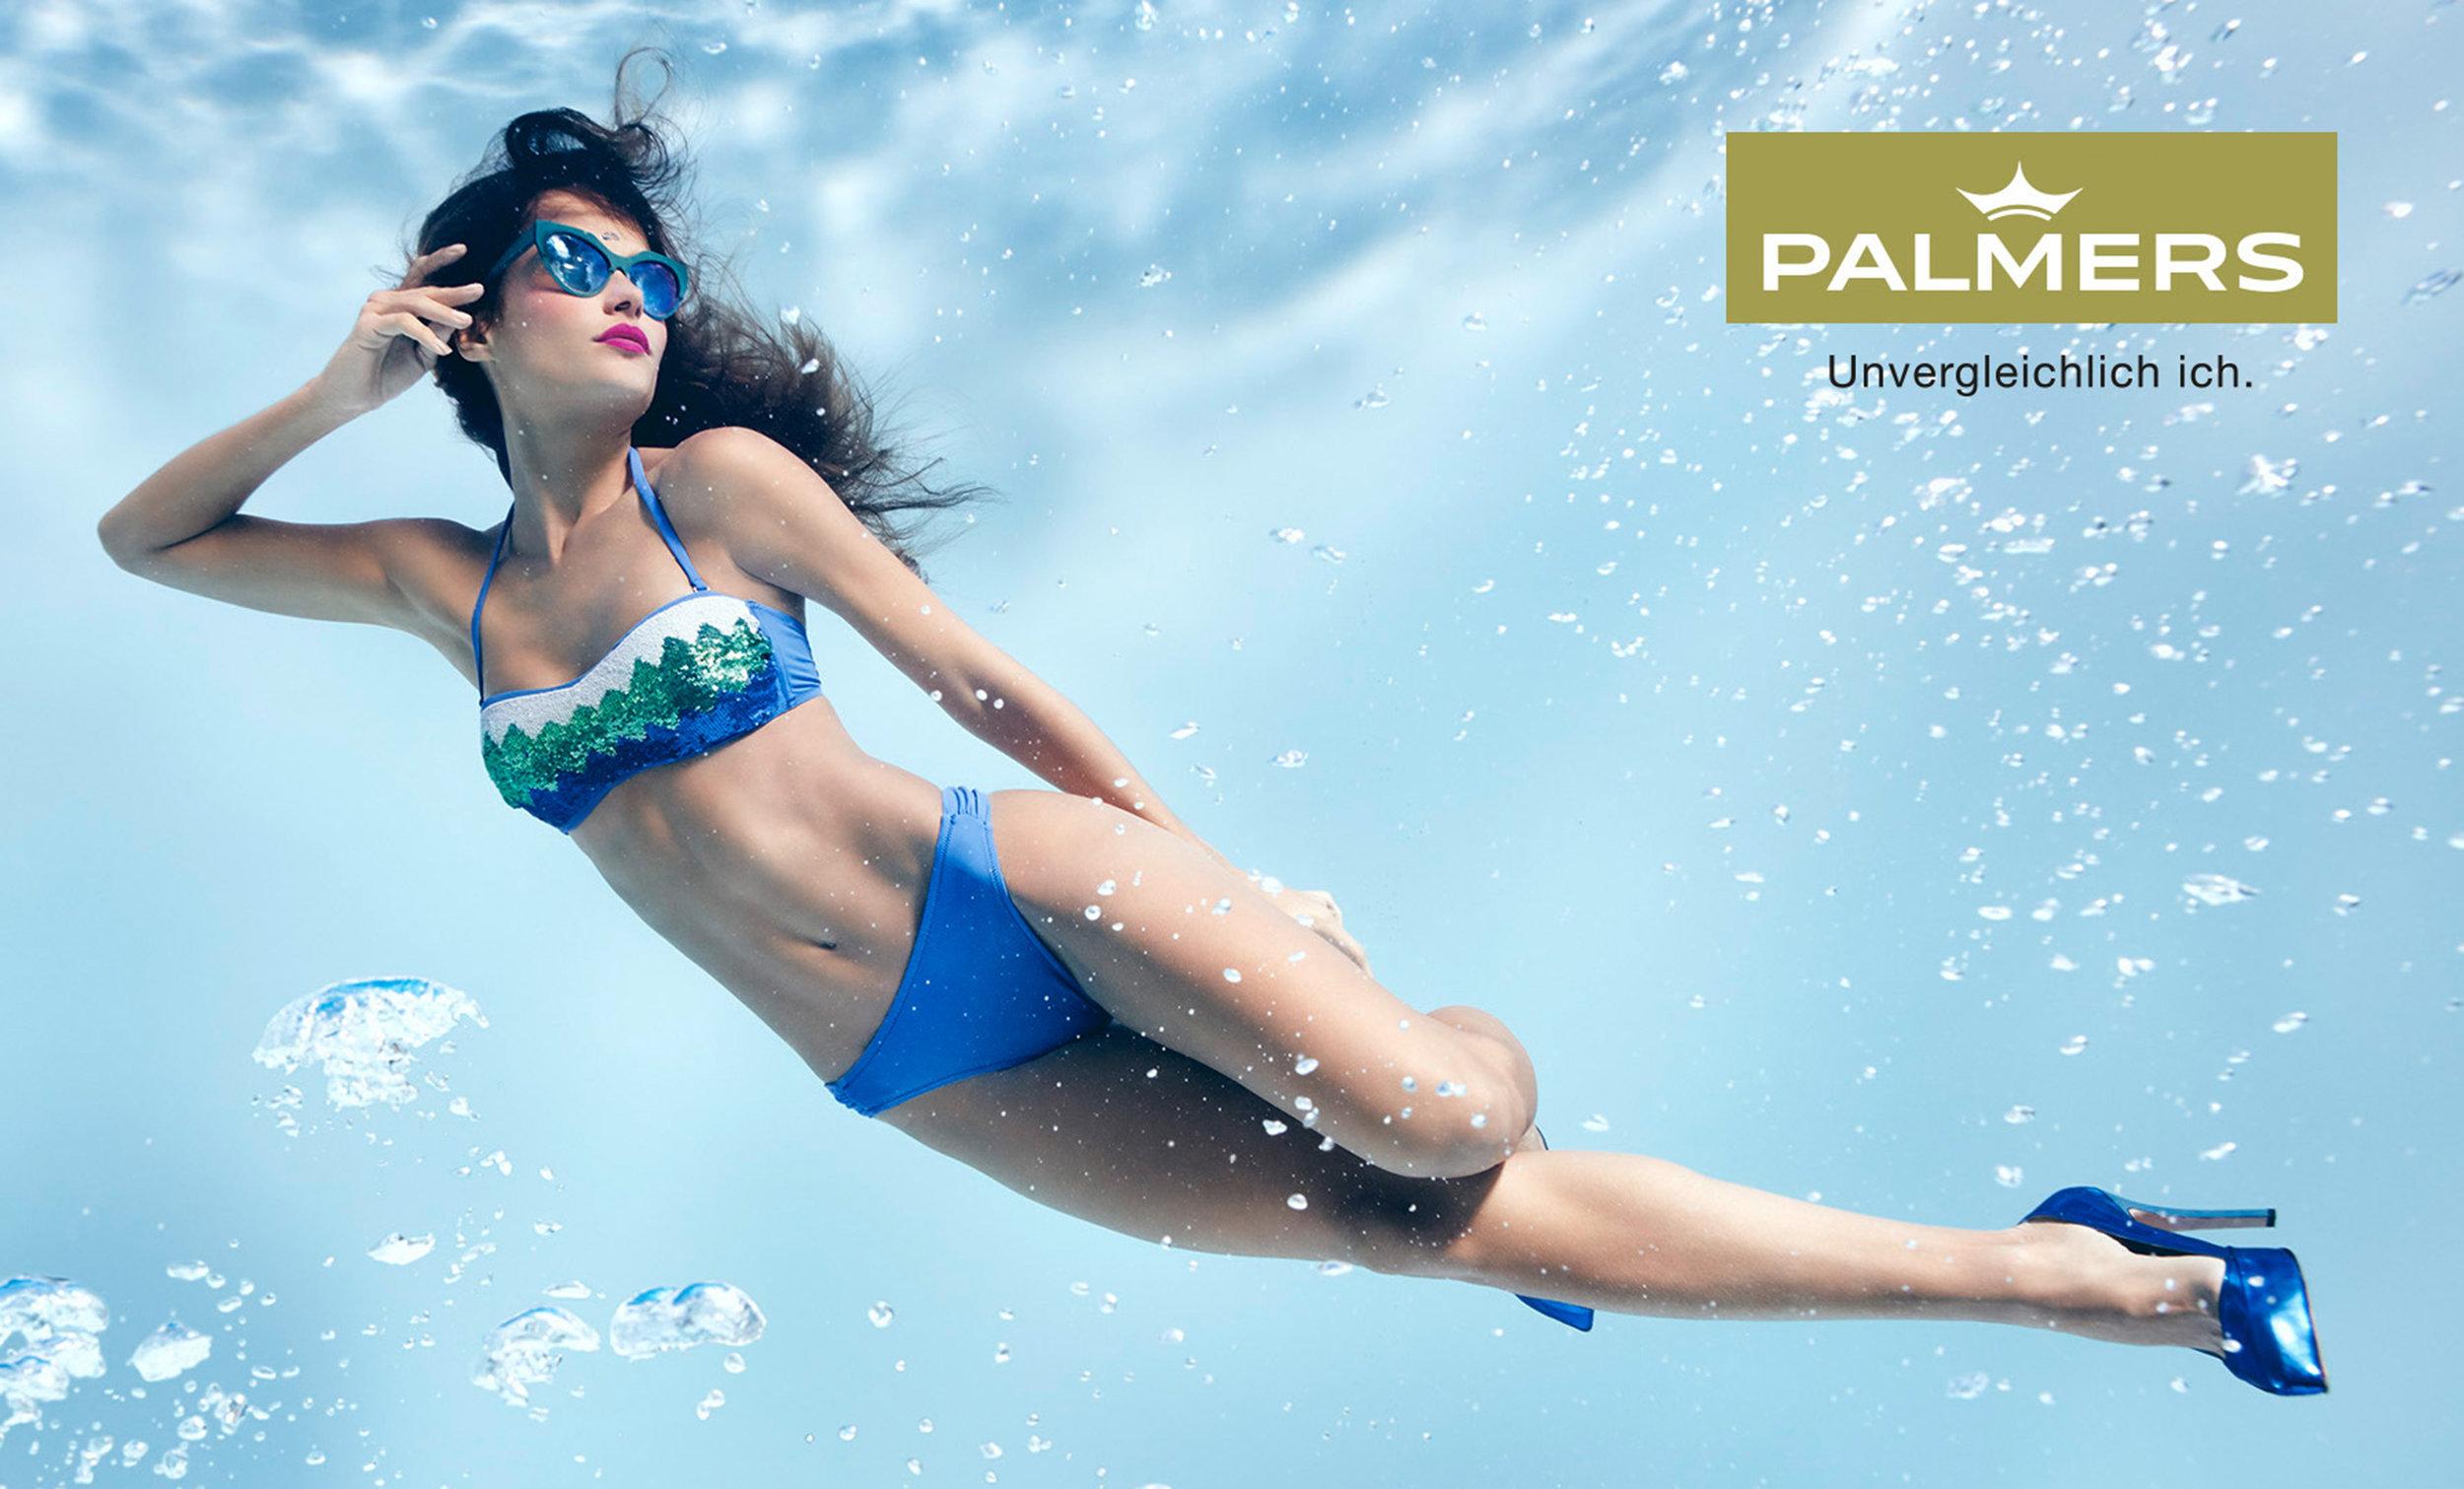 Susanne Stemmer girl underwater in bikini and blue shoes